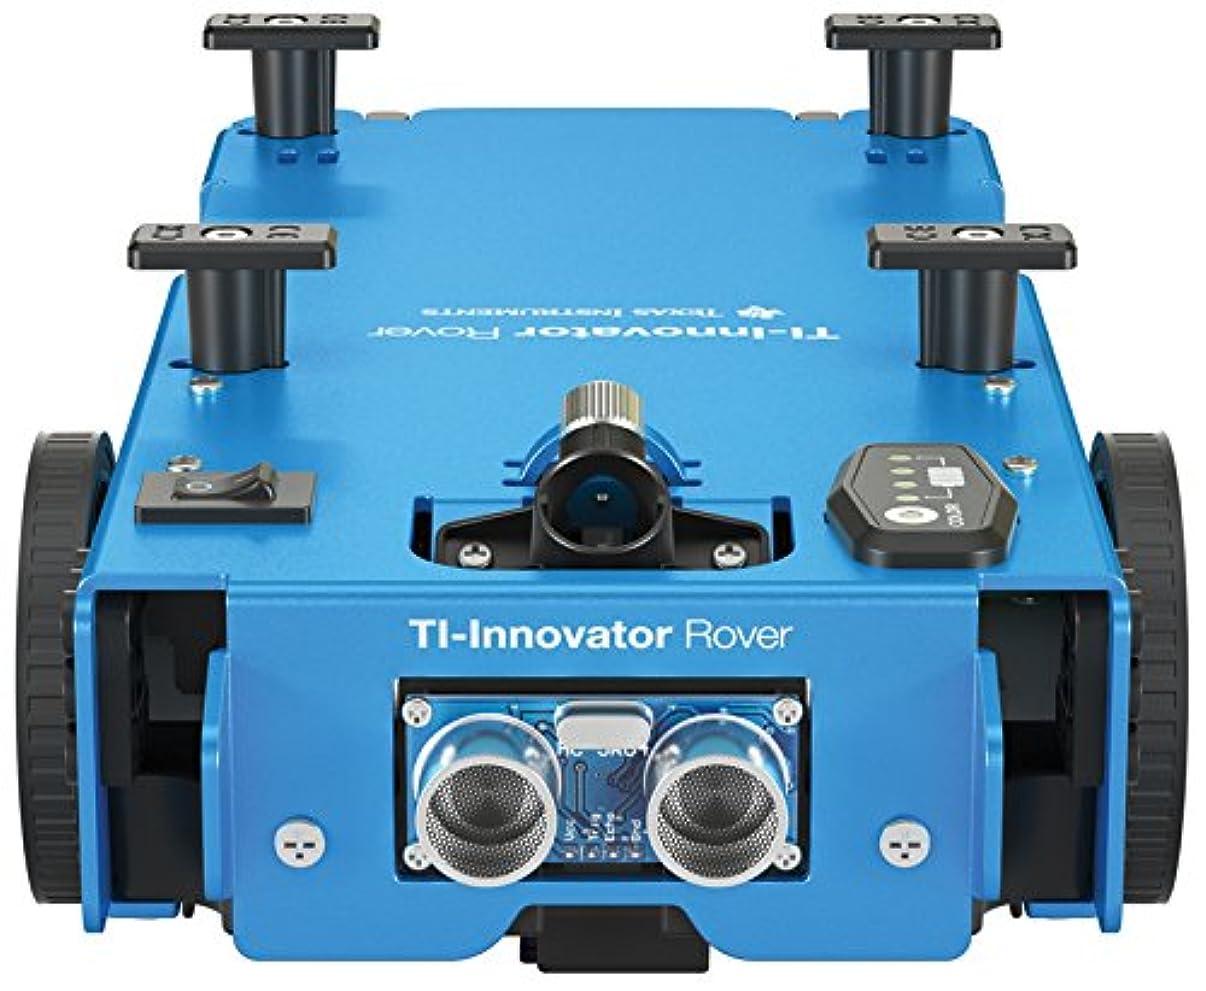 Texas Instruments STEMRV/PWB/8L1/A TI-Innovator Rover Calculator Blue